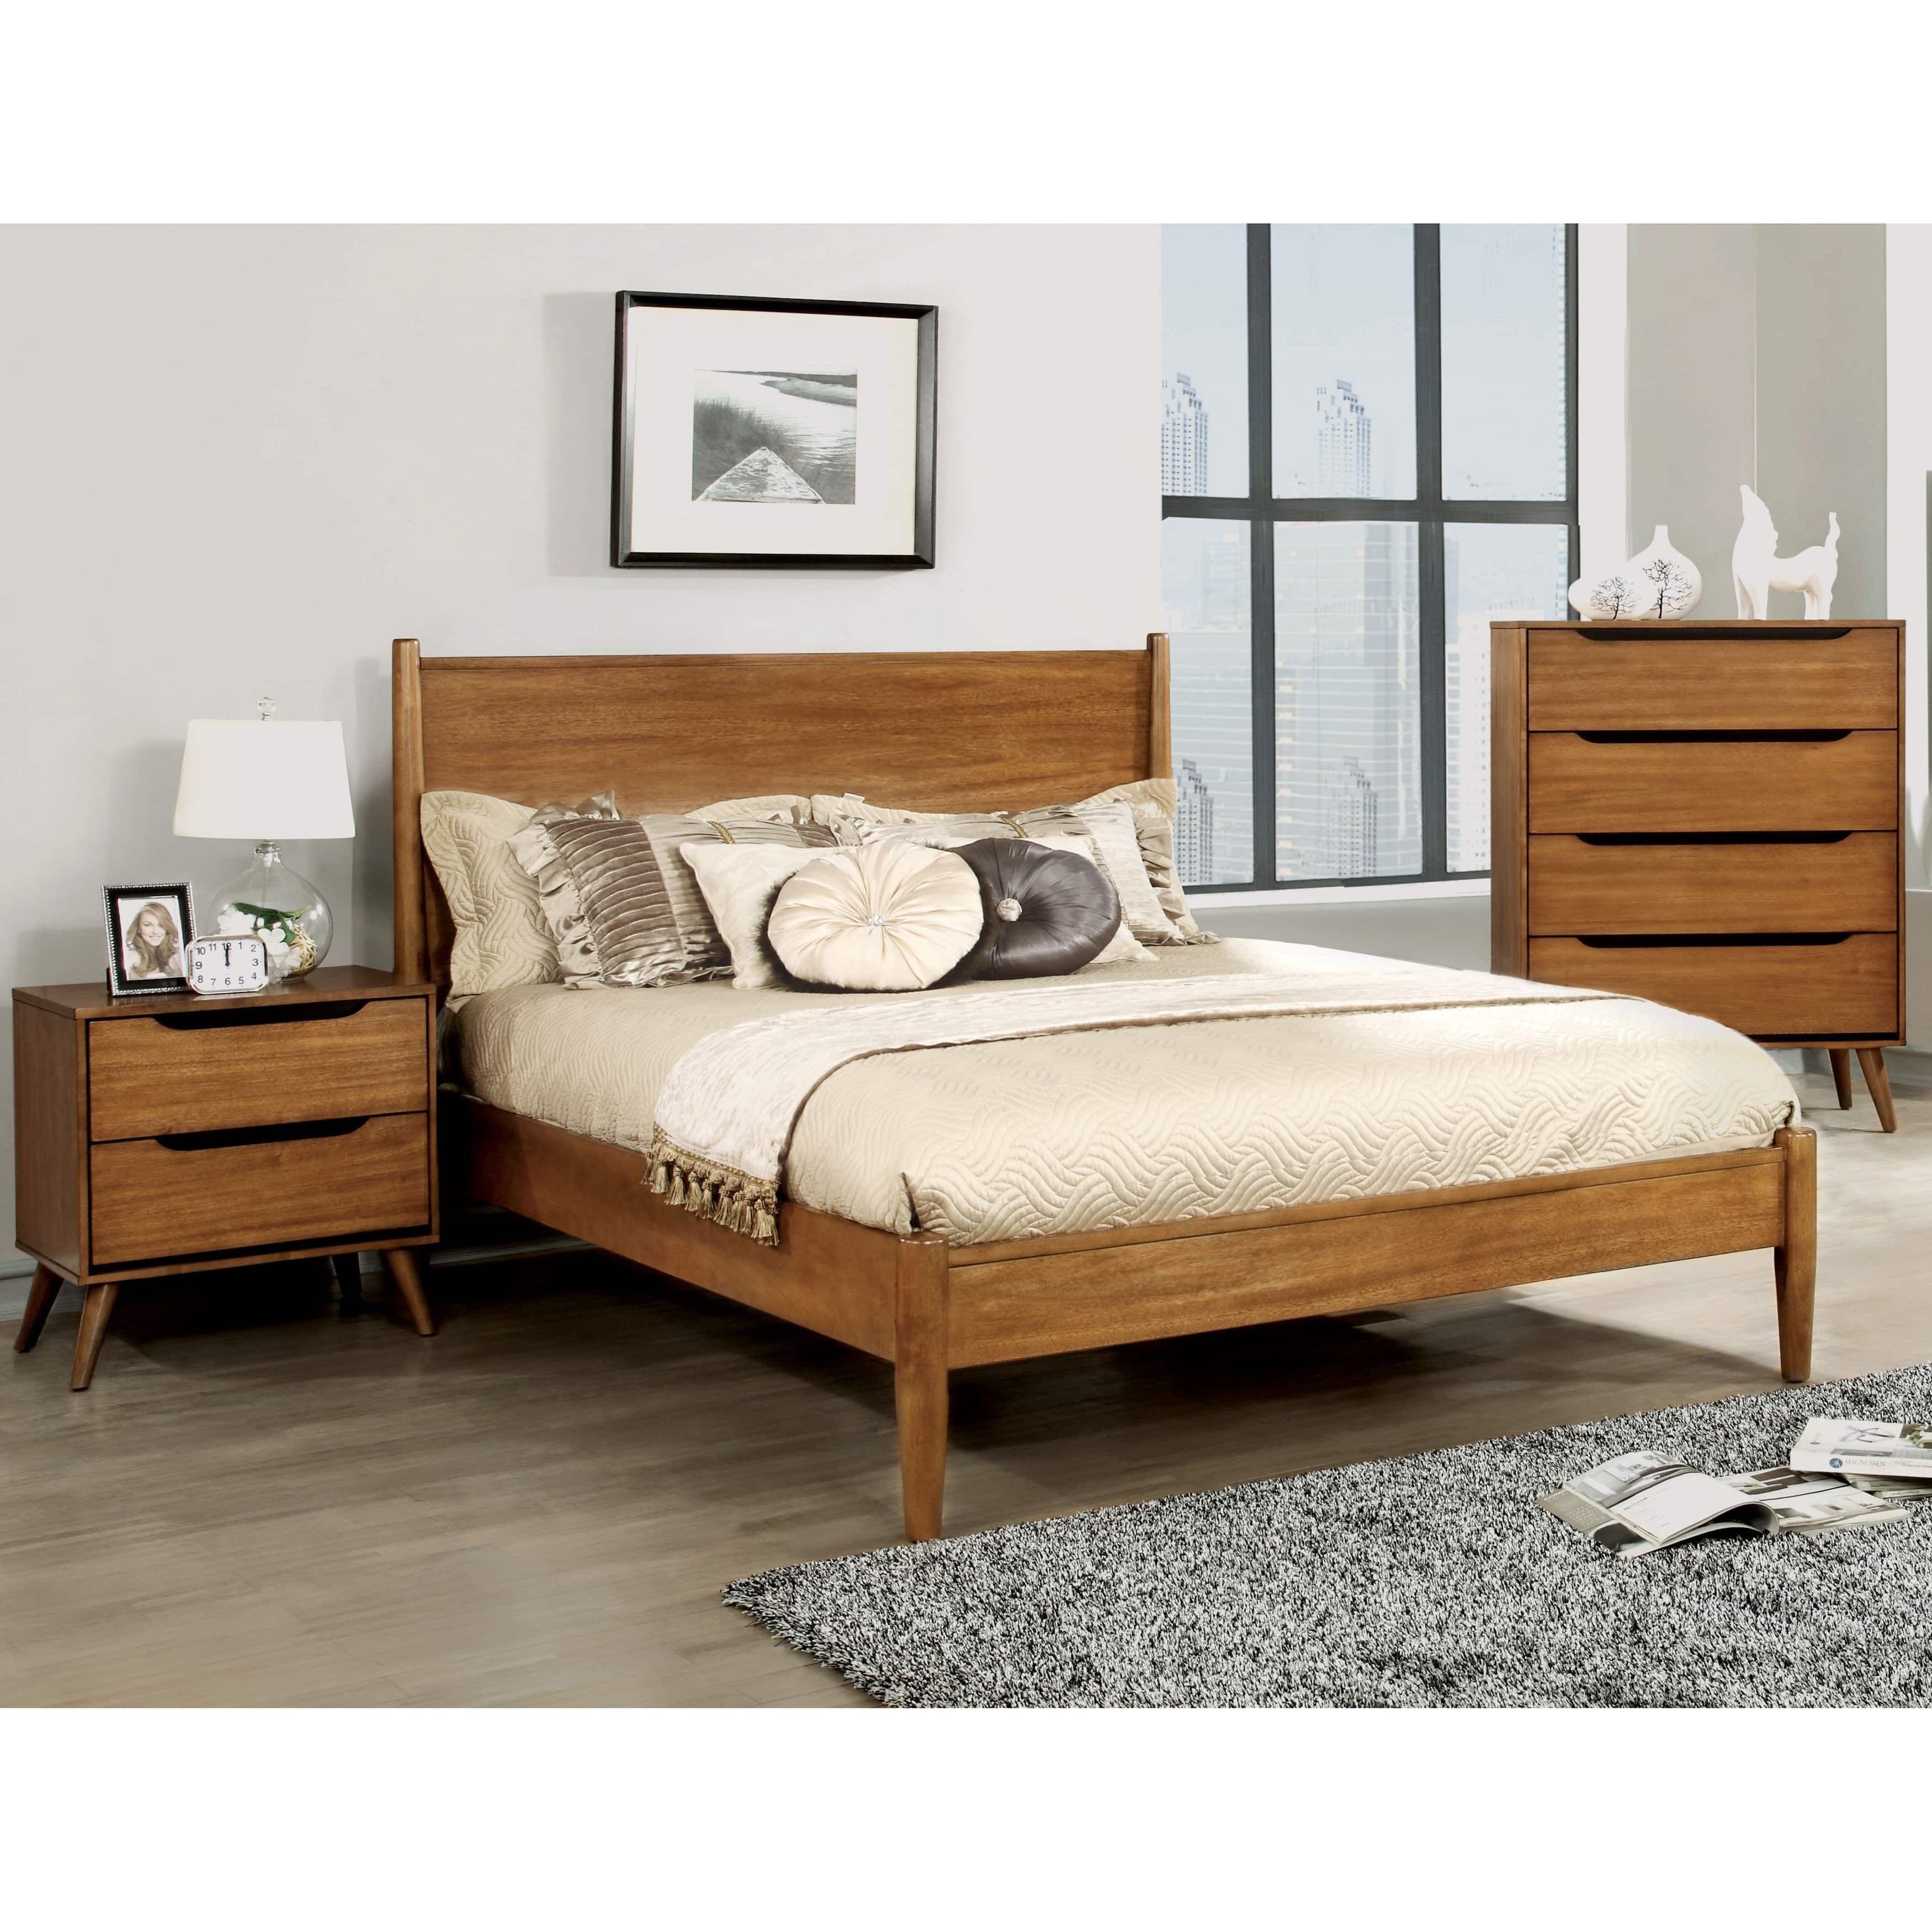 furniture of america corrine mid century modern oak 3 piece bedroom set king brown size eastern king